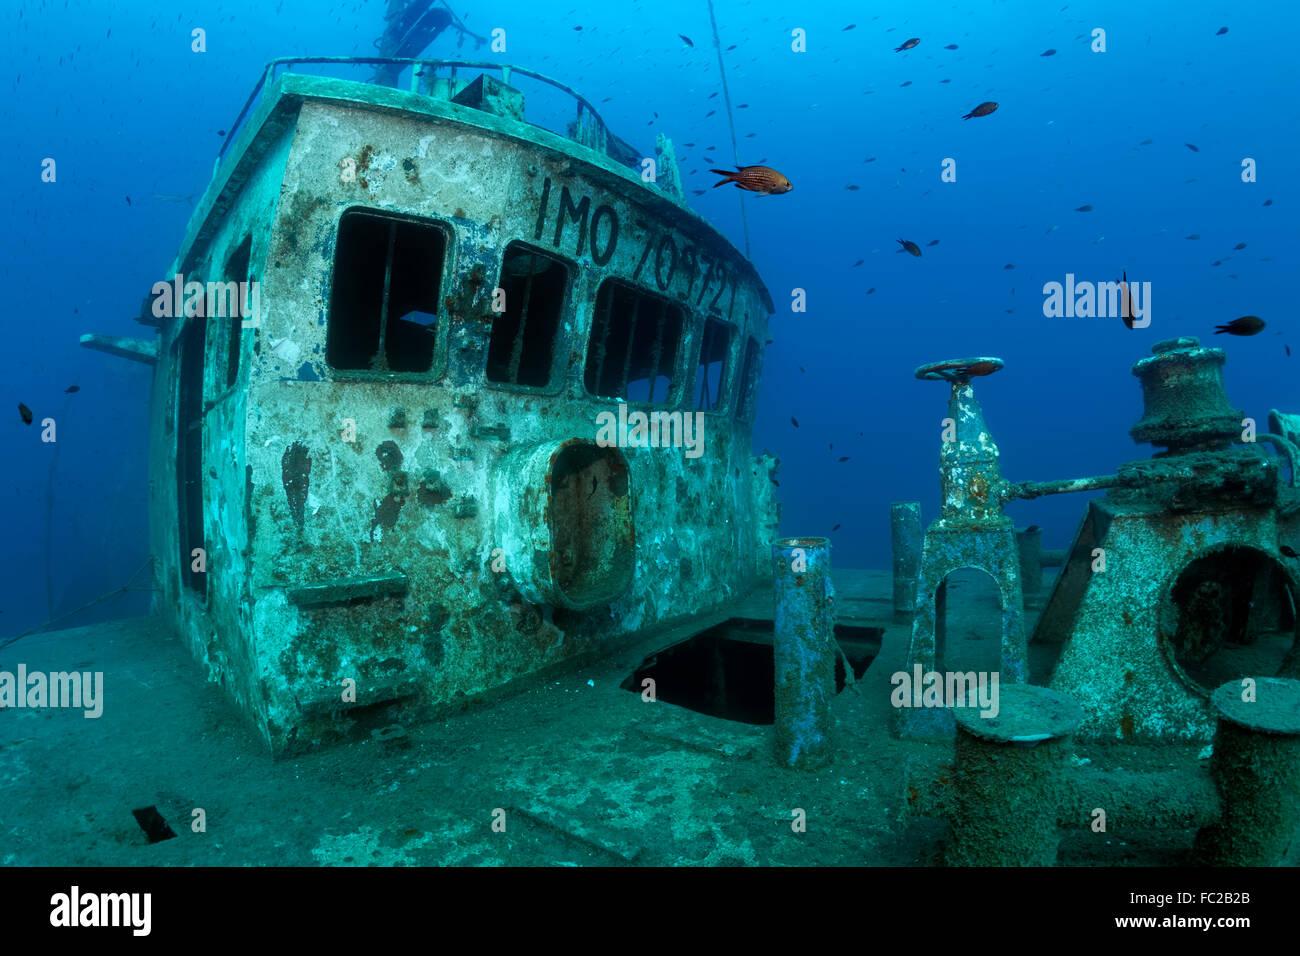 Bridge, Shipwreck, fishing boat Constandis, sunk for divers, underwater reserve Dasoudi, Limassol, Mediterranean, - Stock Image